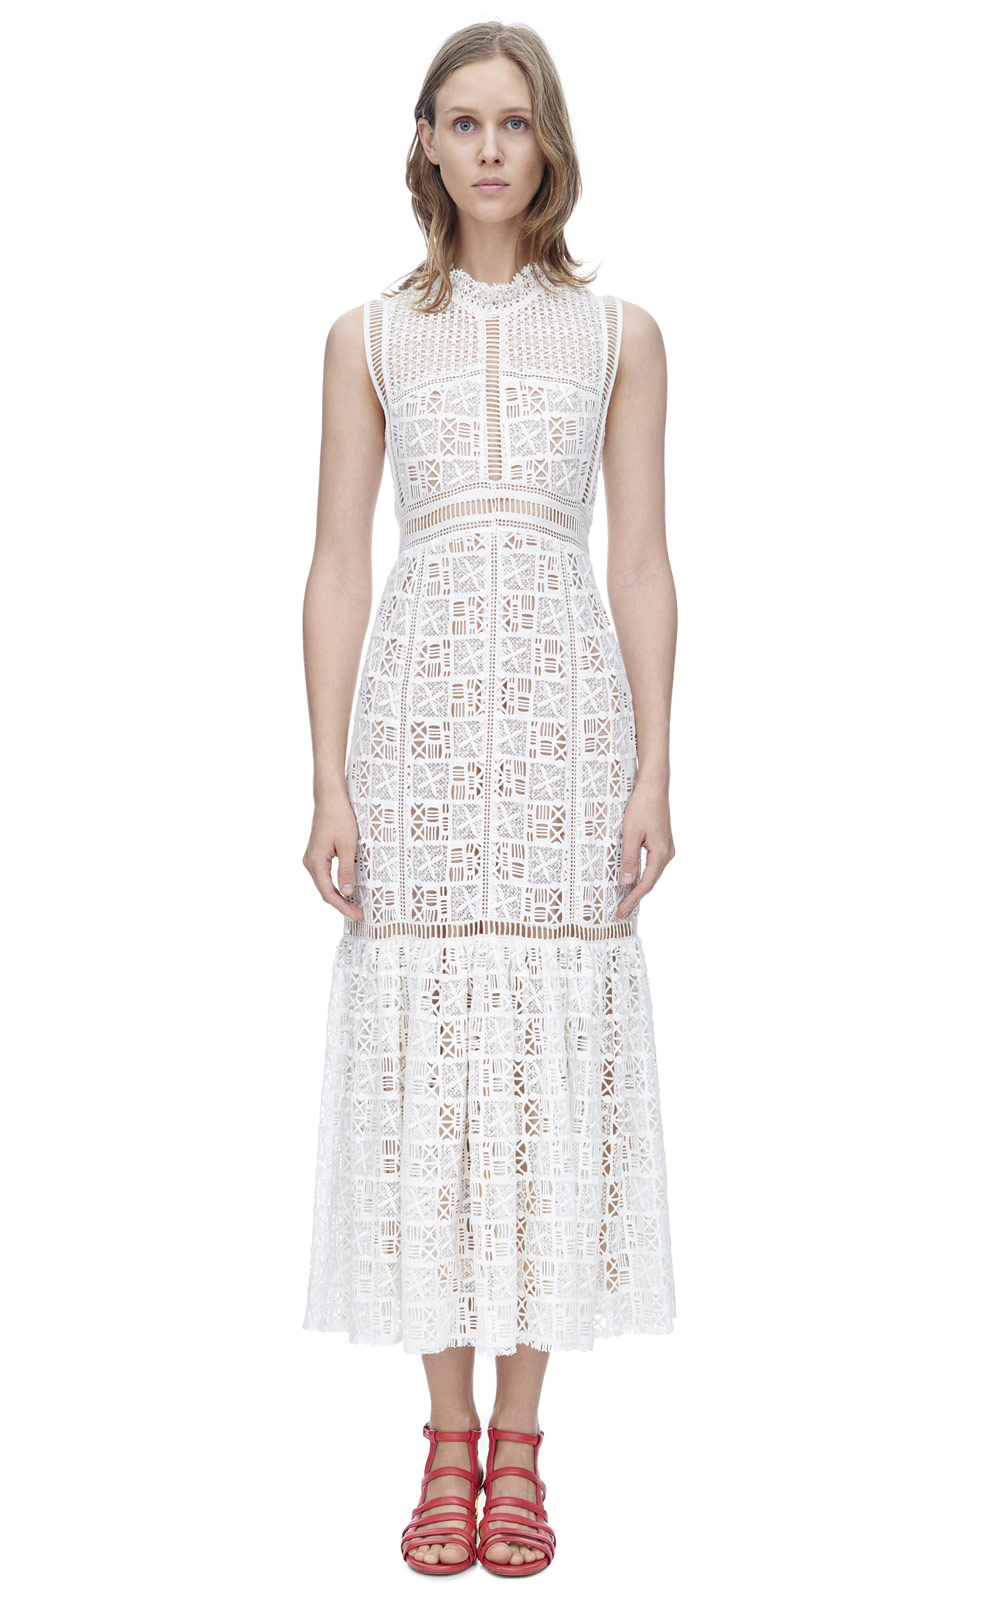 Lyst - Rebecca Taylor Sleeveless Crochet Lace Dress in White